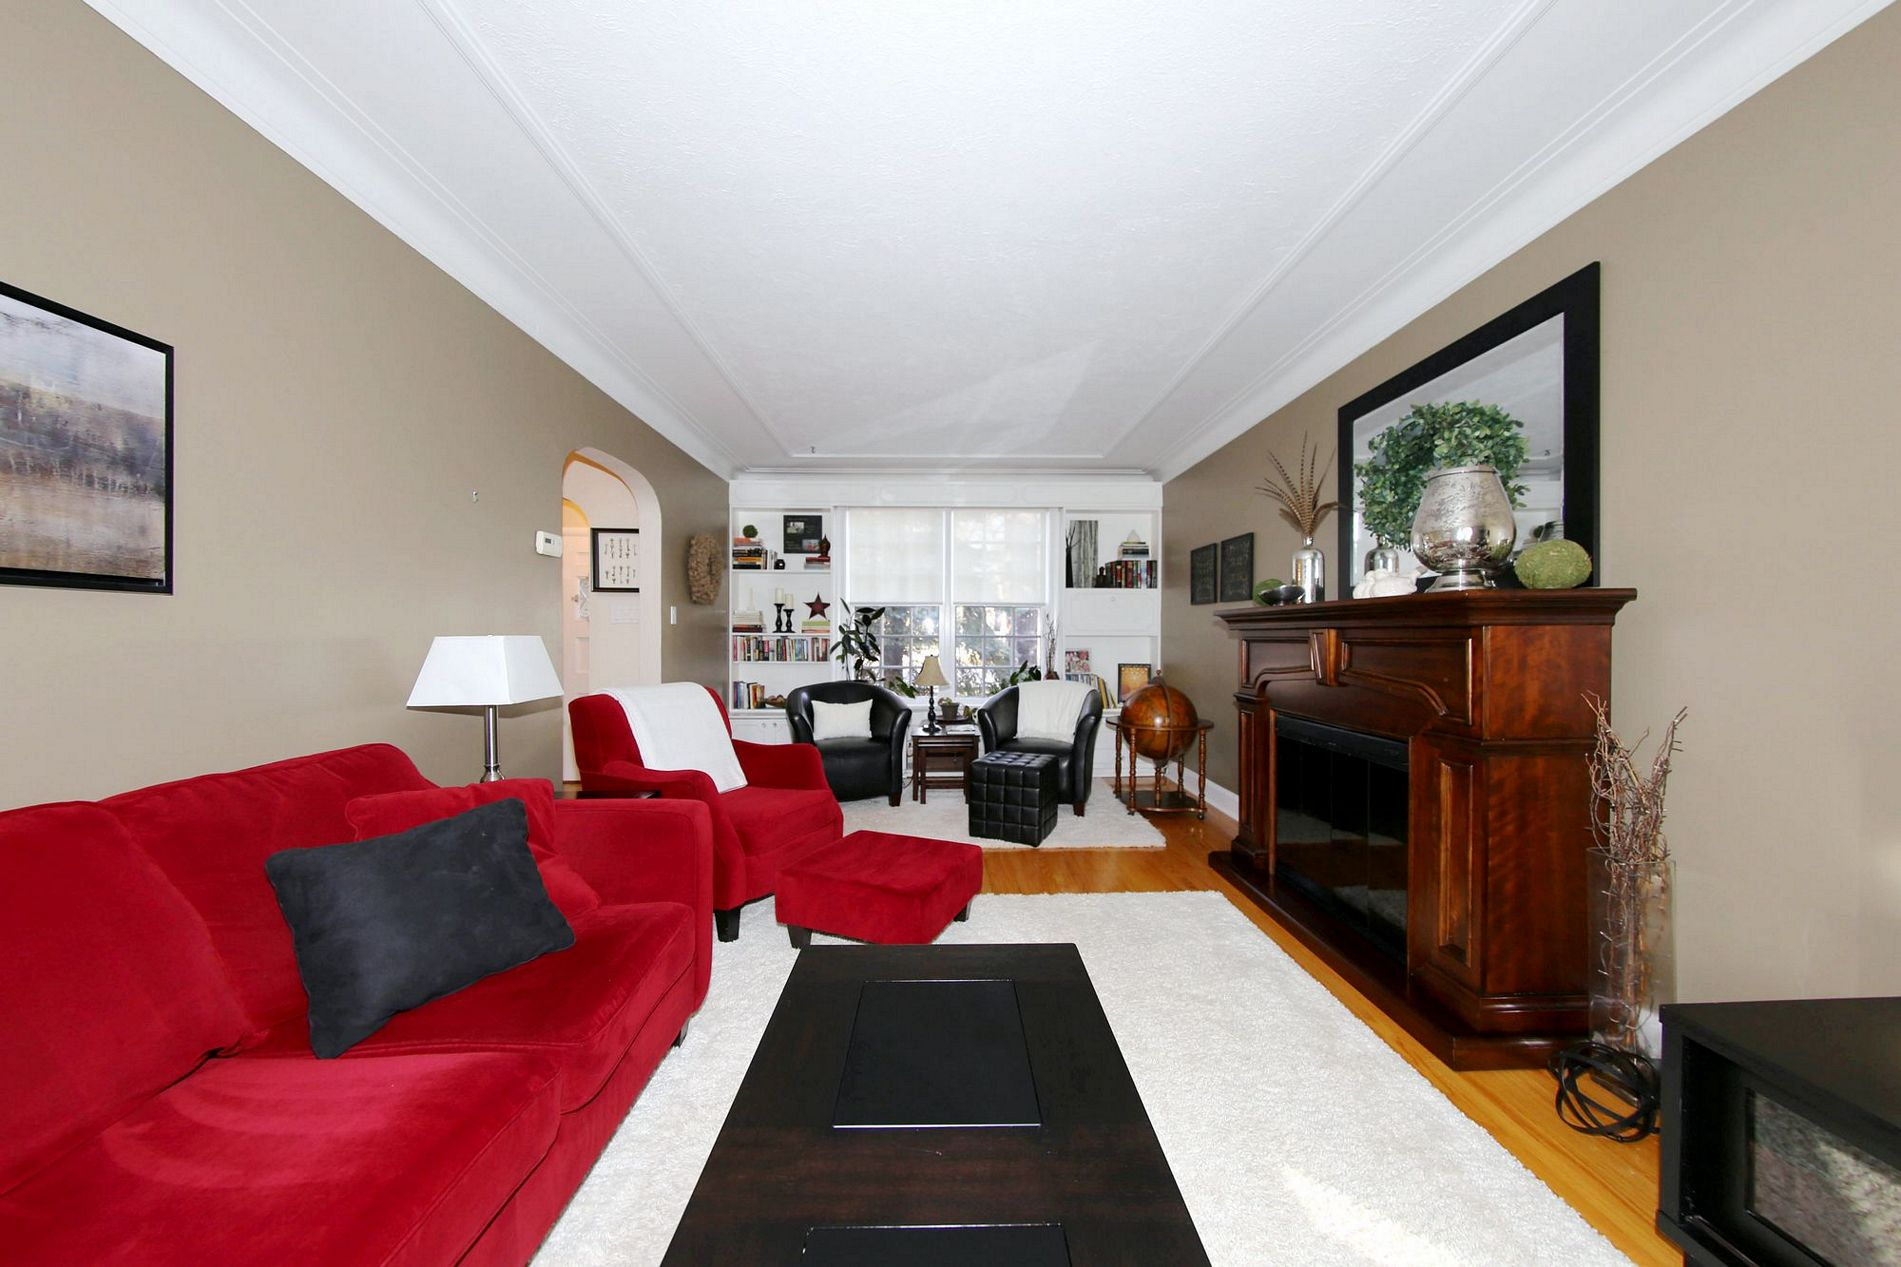 1202 Grosvenor Ave, Winnipeg, Manitoba  R3M 0P1 - Photo 3 - 1728775